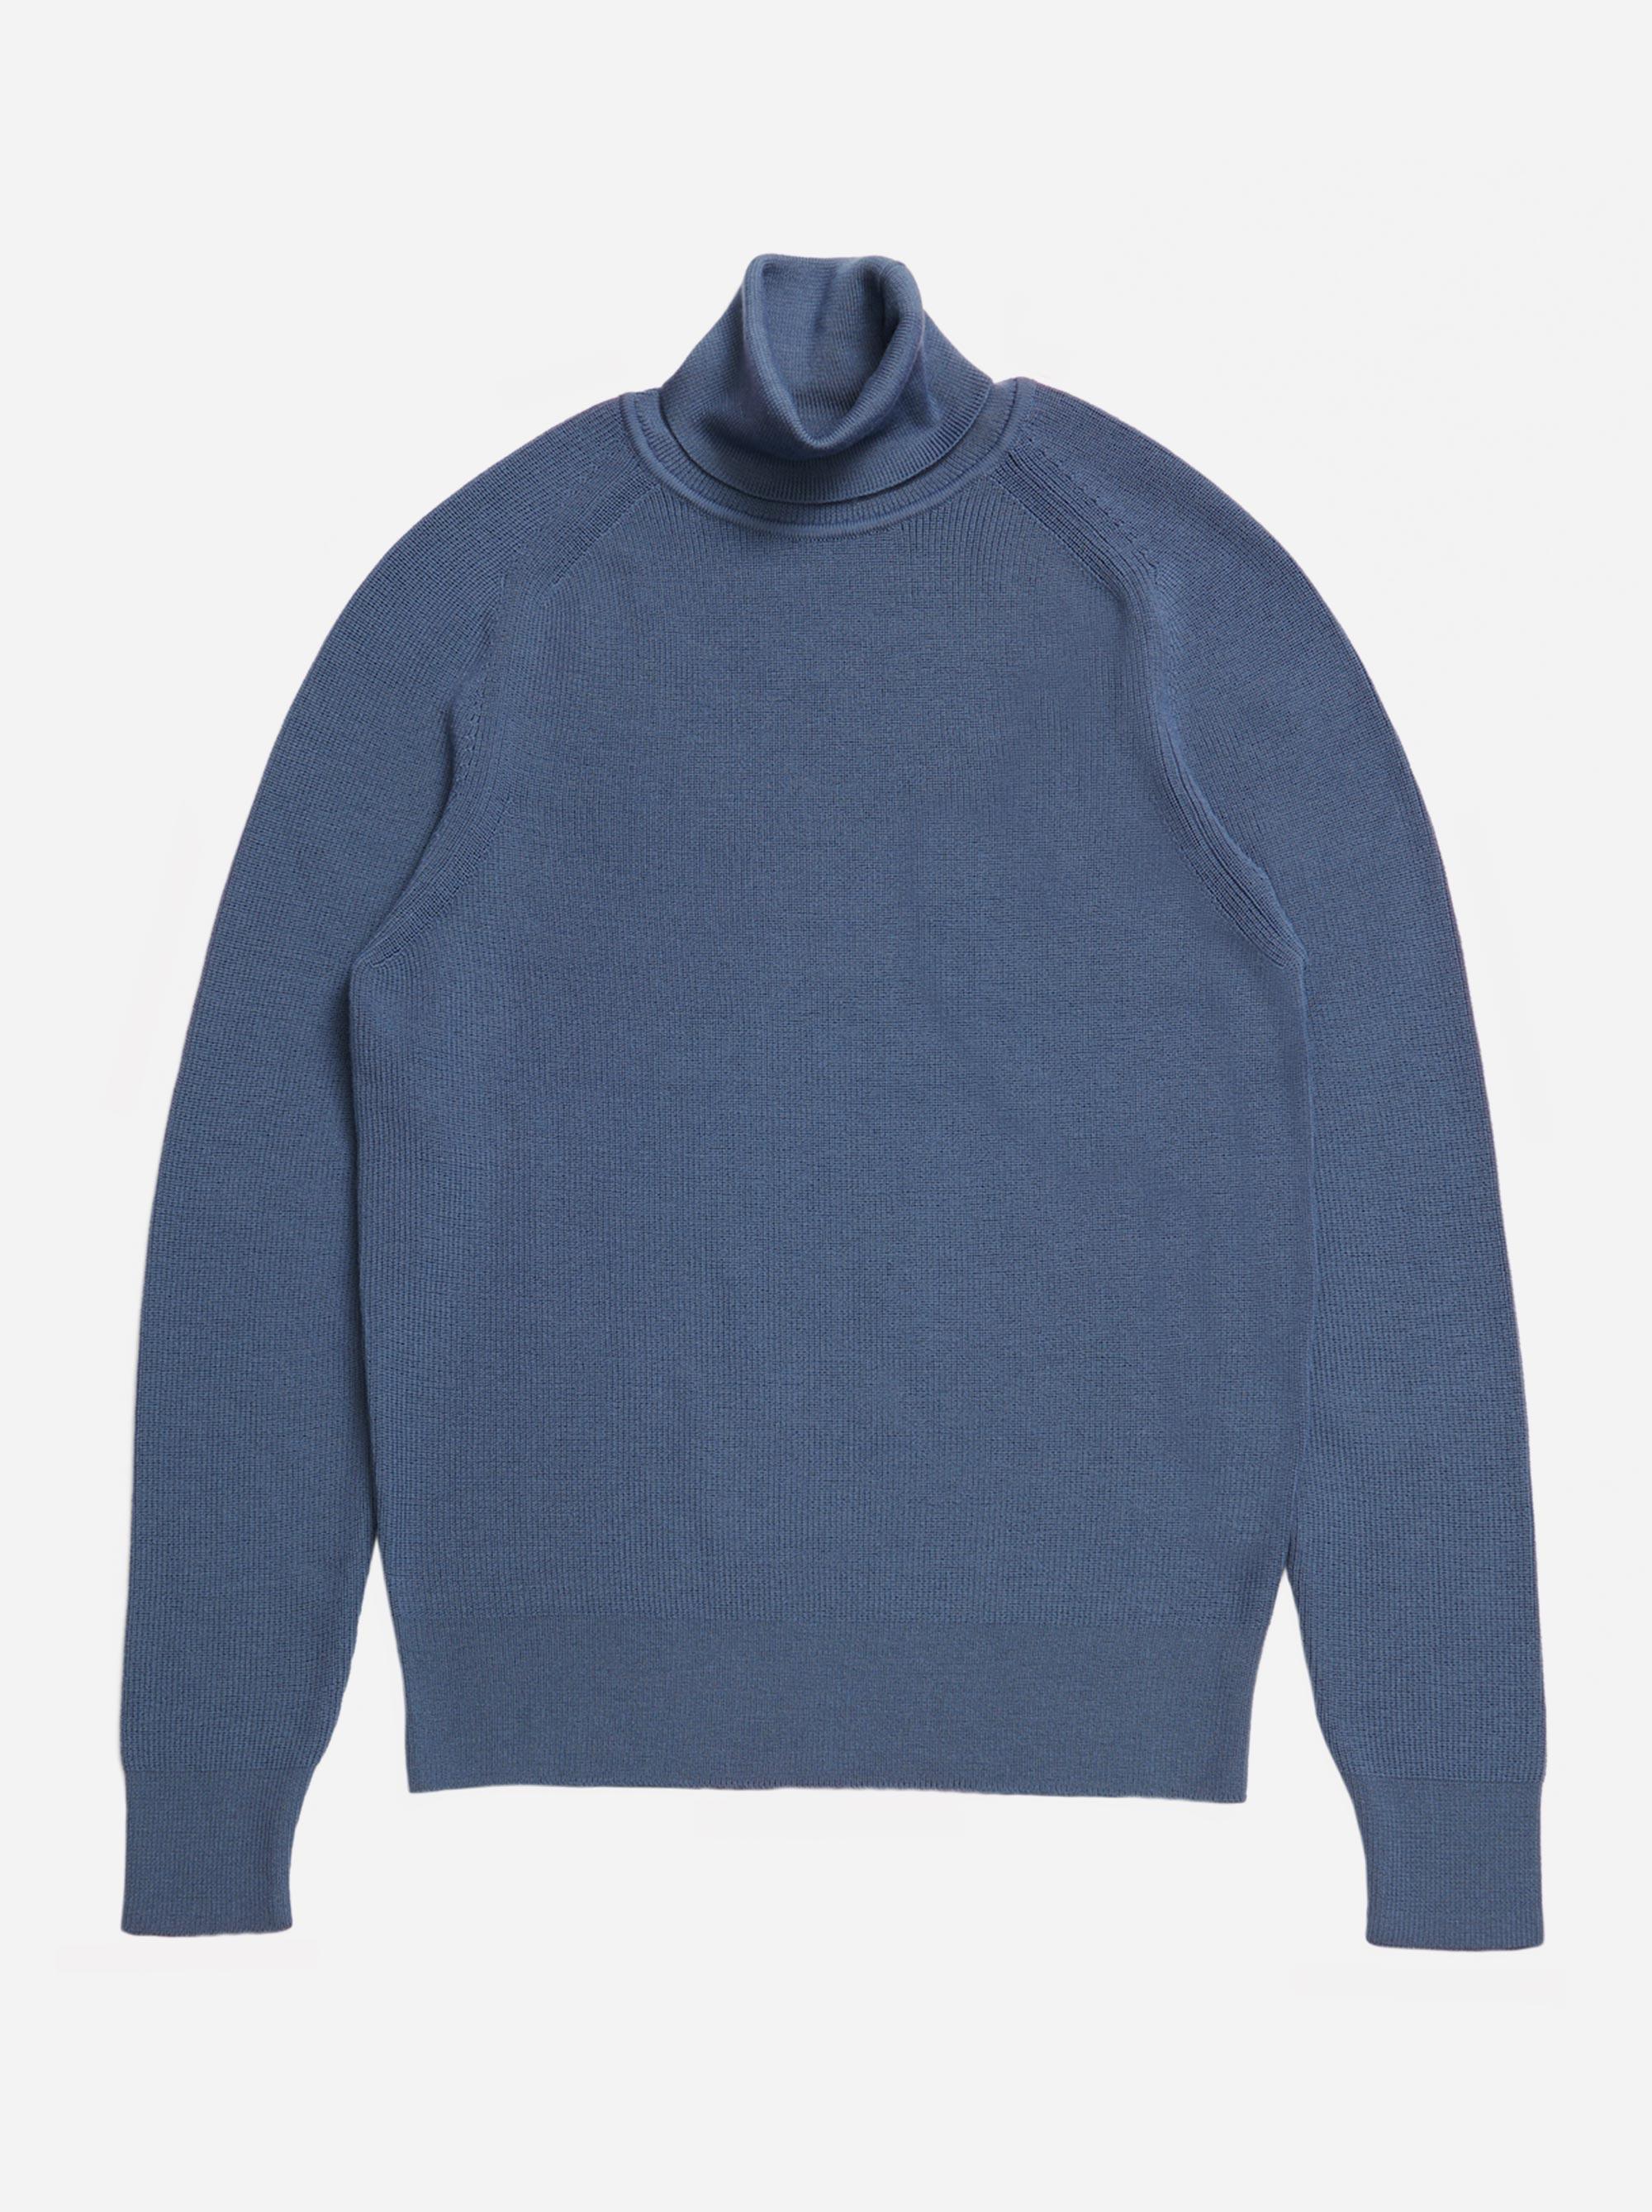 Teym - Turtleneck - The Merino Sweater - Men - Sky Blue - 4